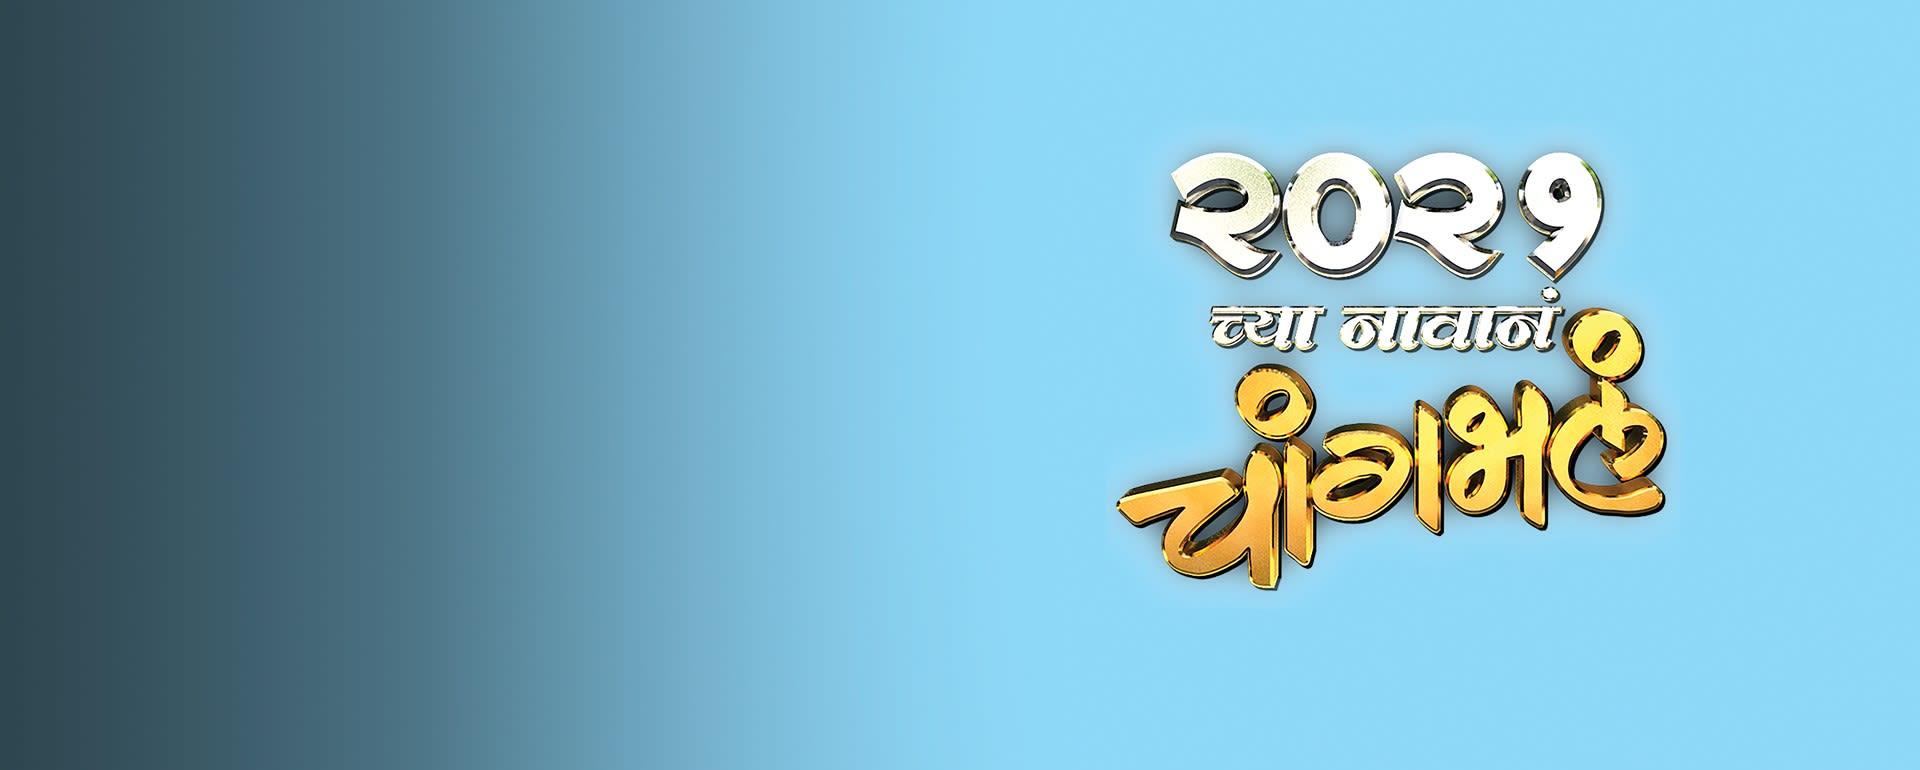 2021 Chya Navana Changbhala